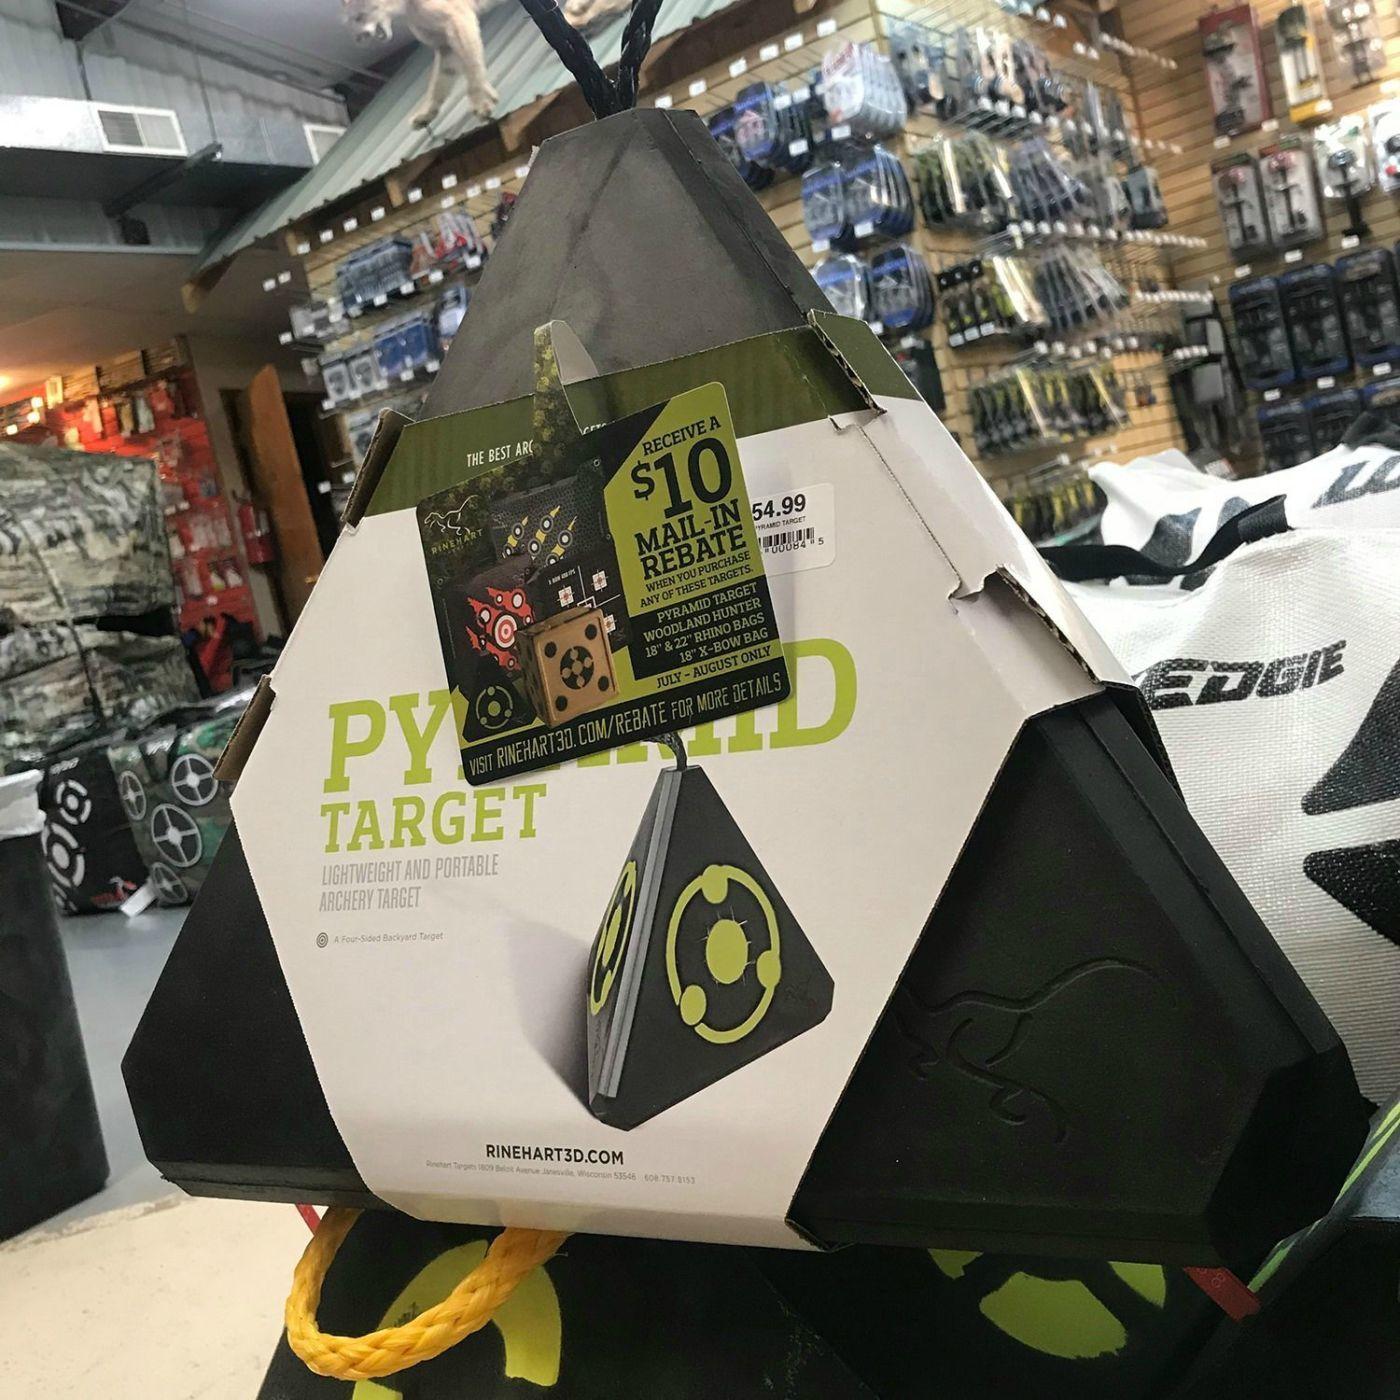 Mail In Rebate Offers >> 2019 Mail In Rebate Offers From Rinehart Targets Archery